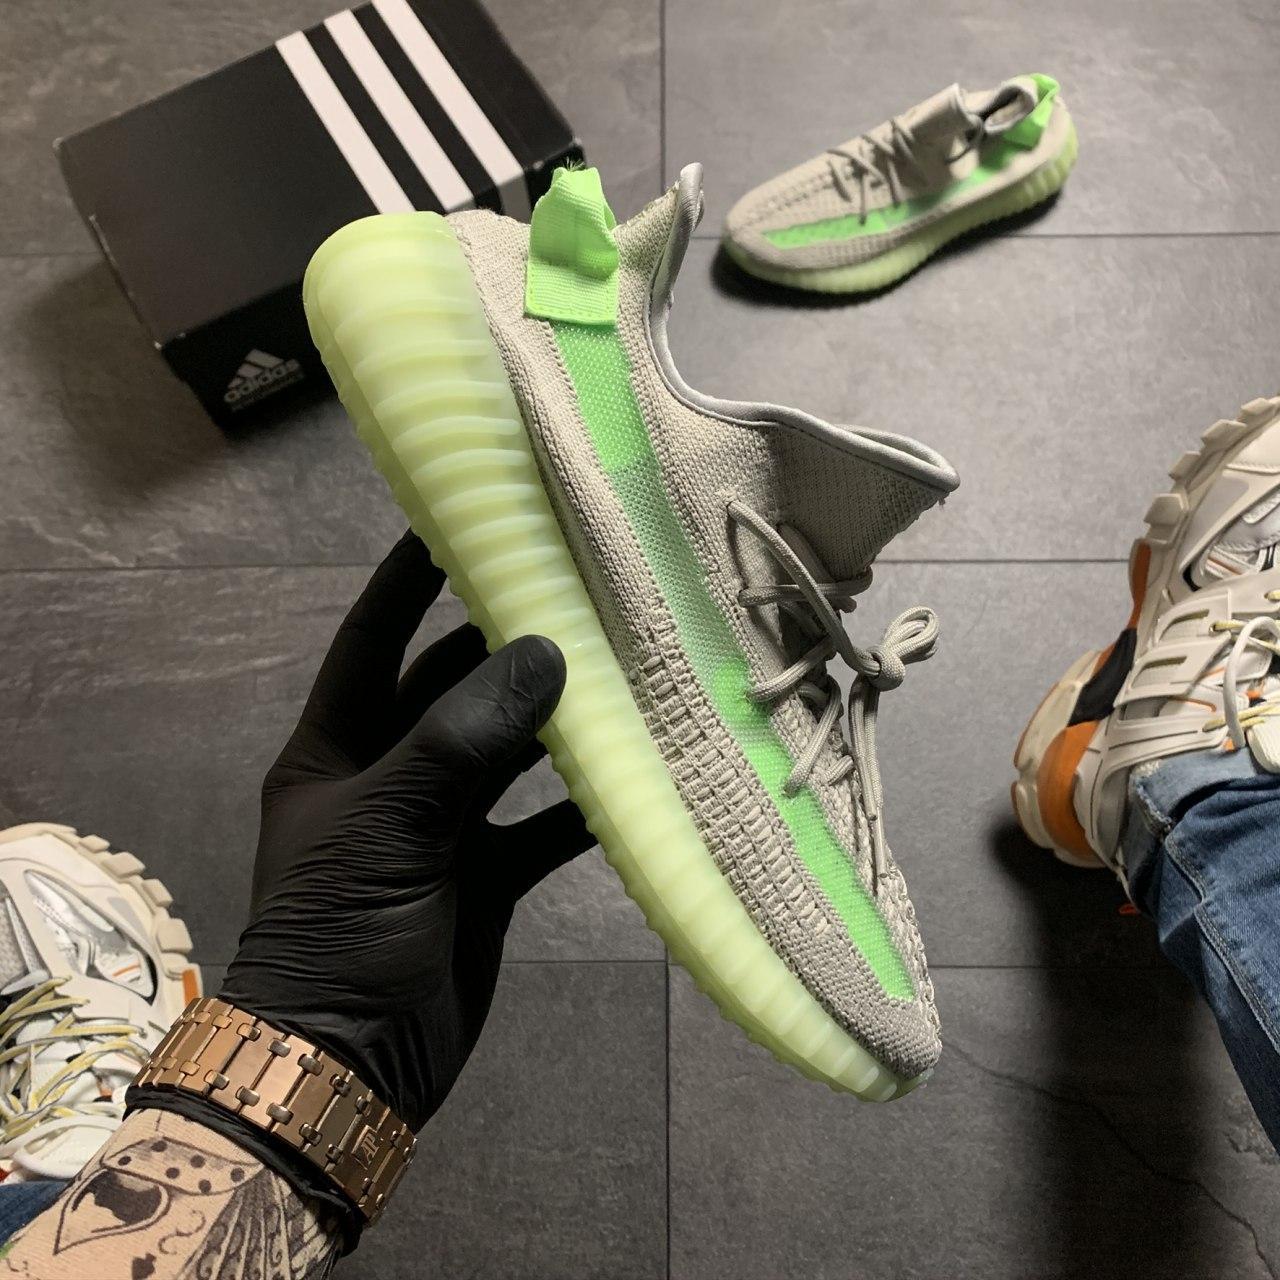 Кроссовки Adidas Yeezy Boost 350 v2 Grey Green